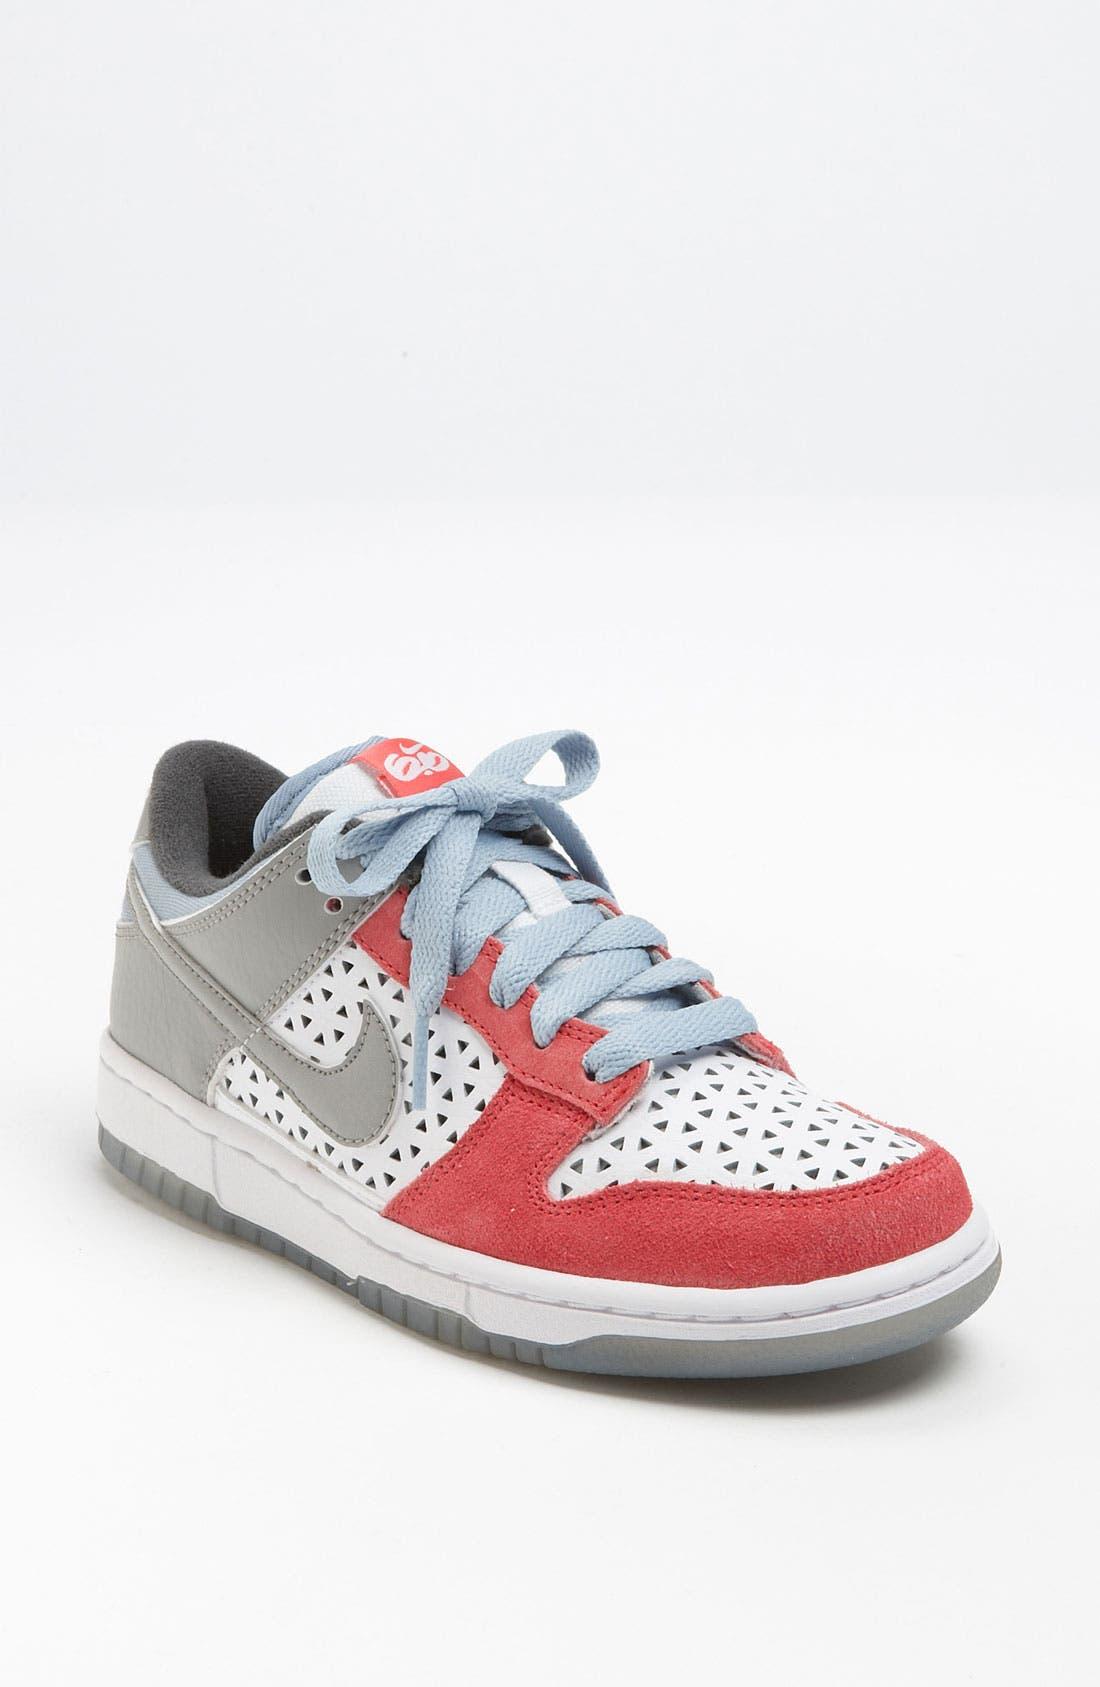 Alternate Image 1 Selected - Nike 'Dunk Low 6.0' Sneaker (Women) (Exclusive)